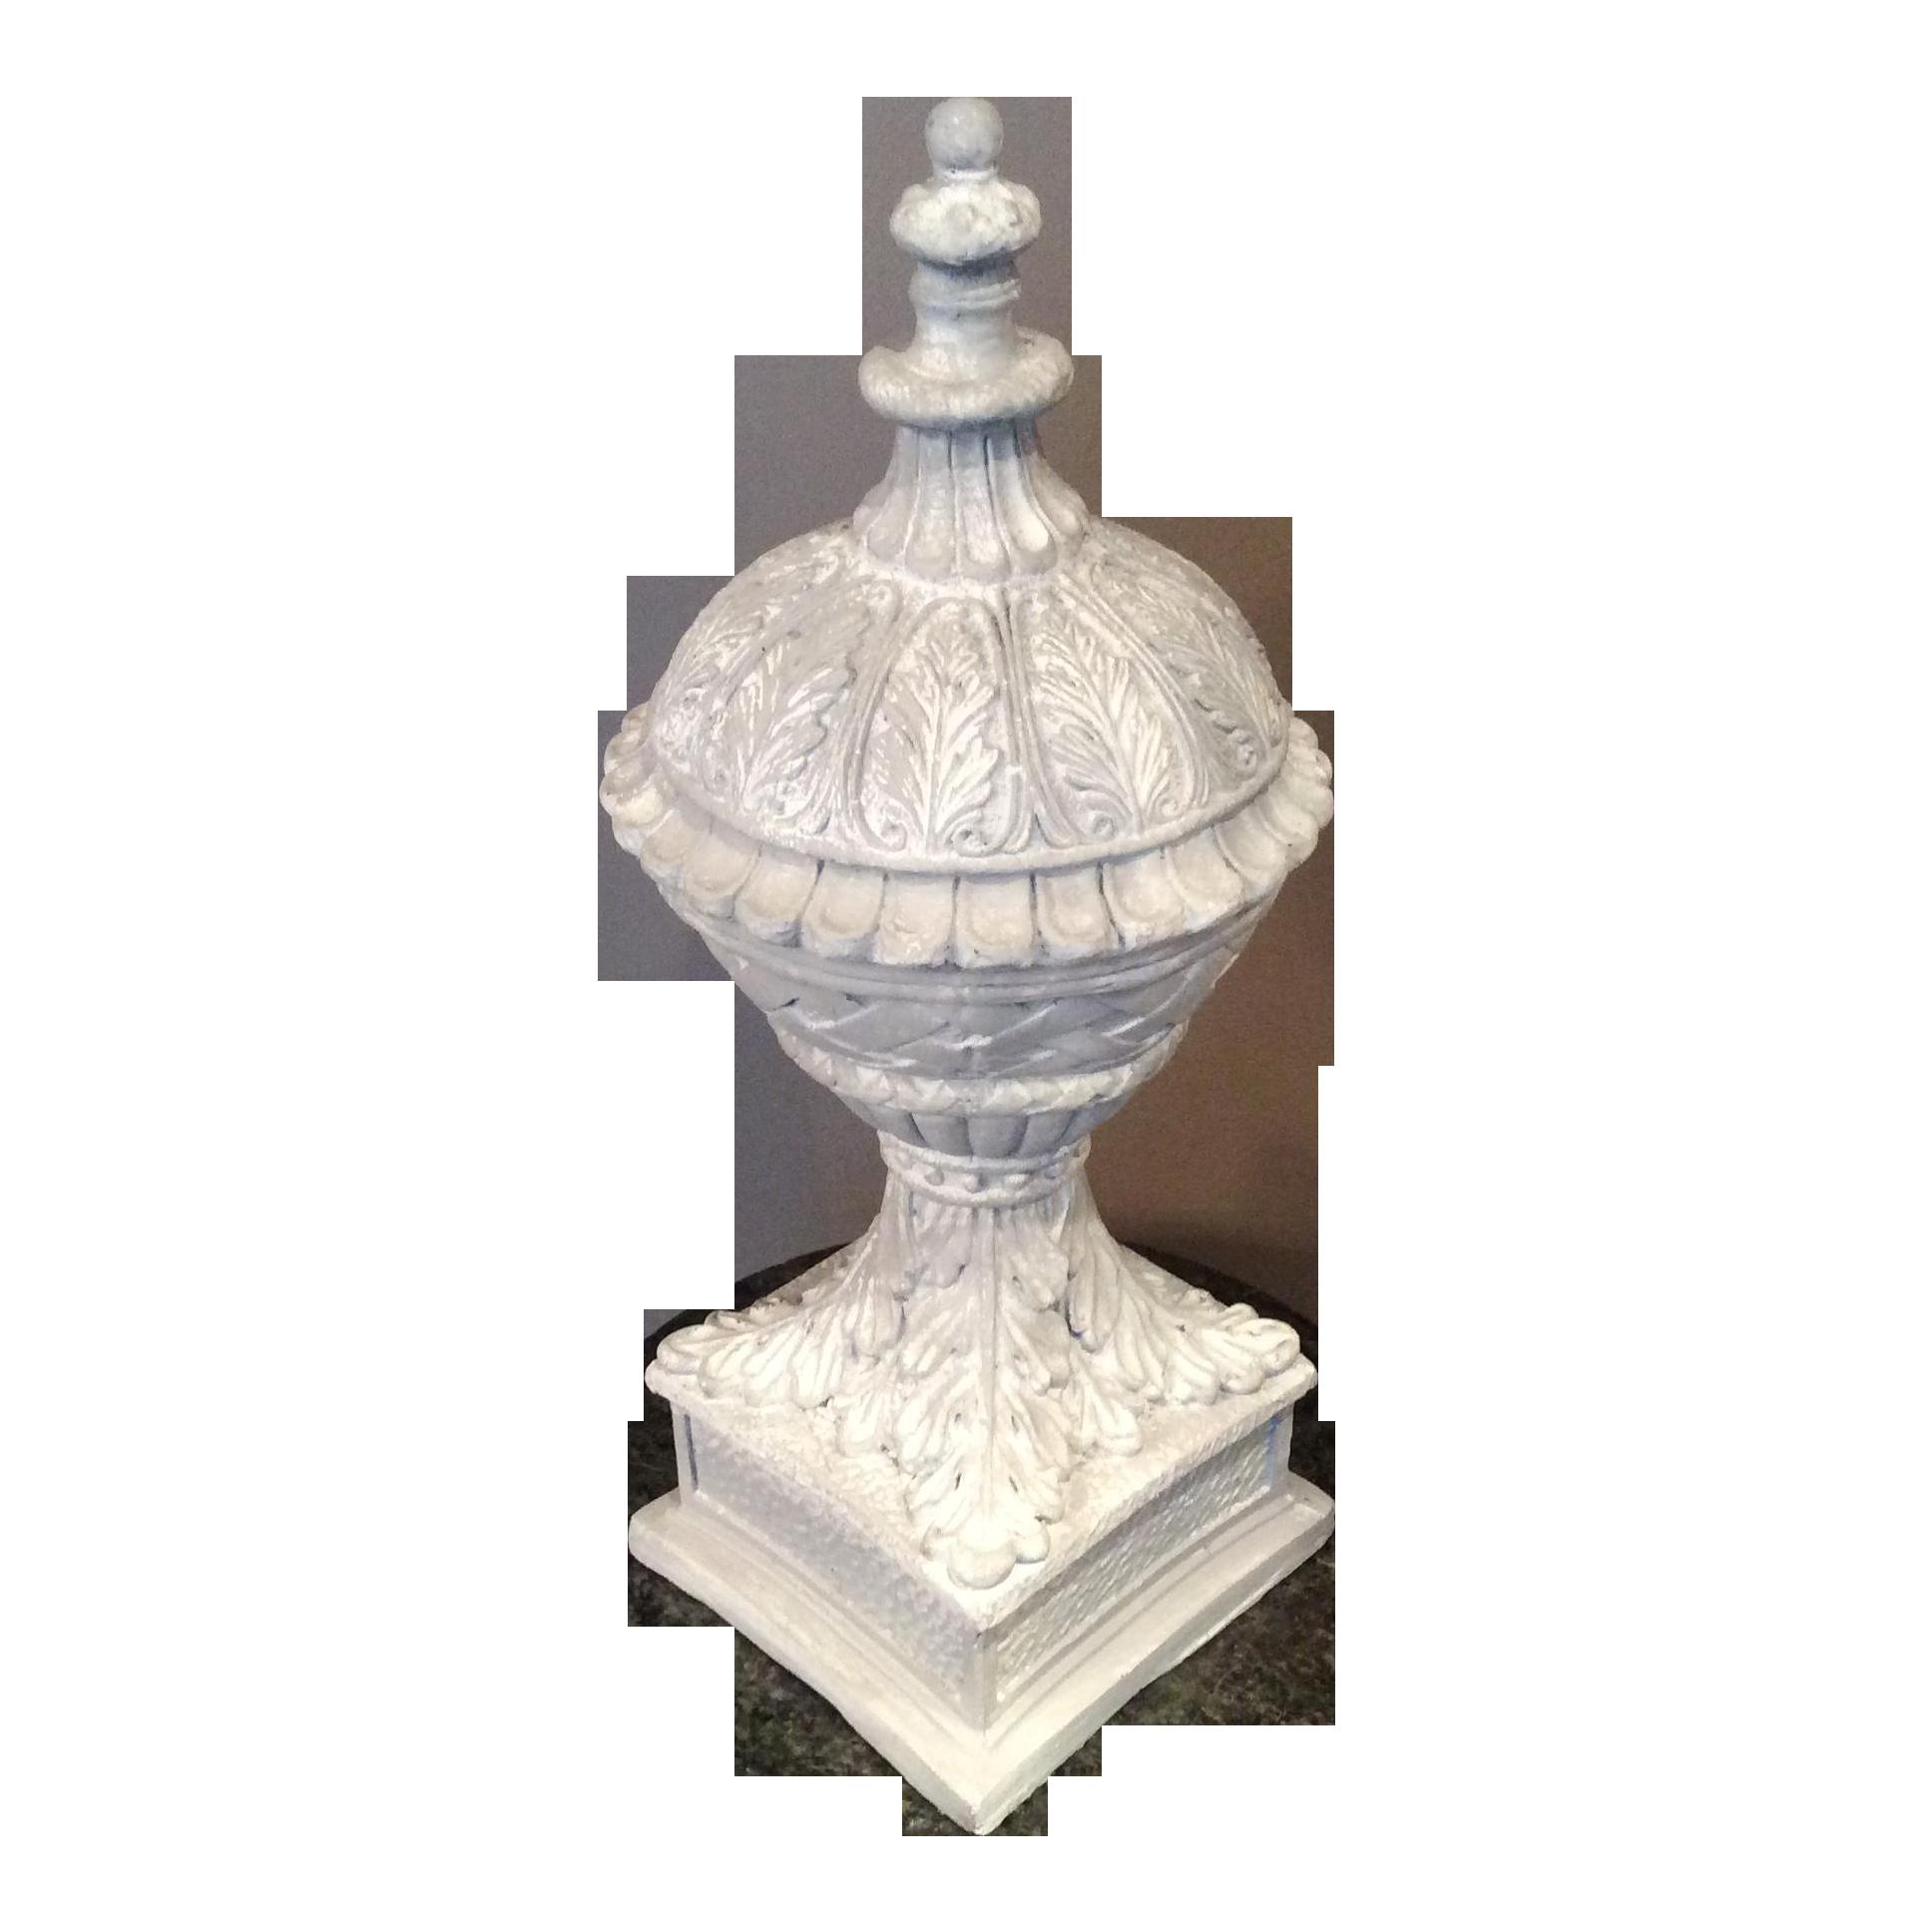 Neoclassical Plaster Garden Finial